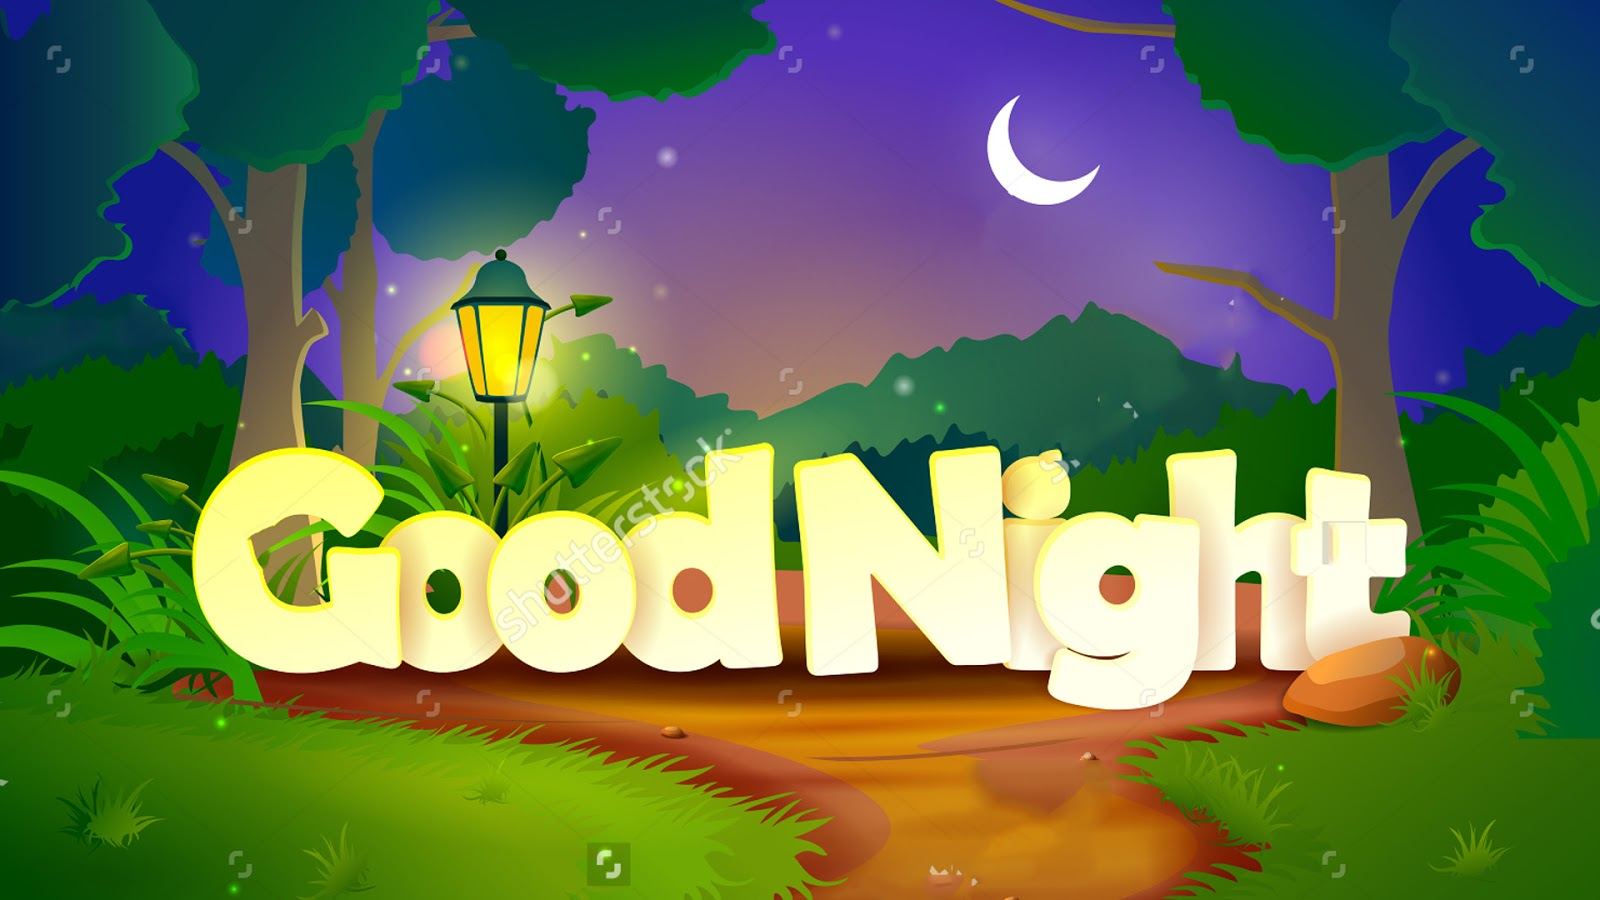 Good Night W... First Night Full Movie Download Hd